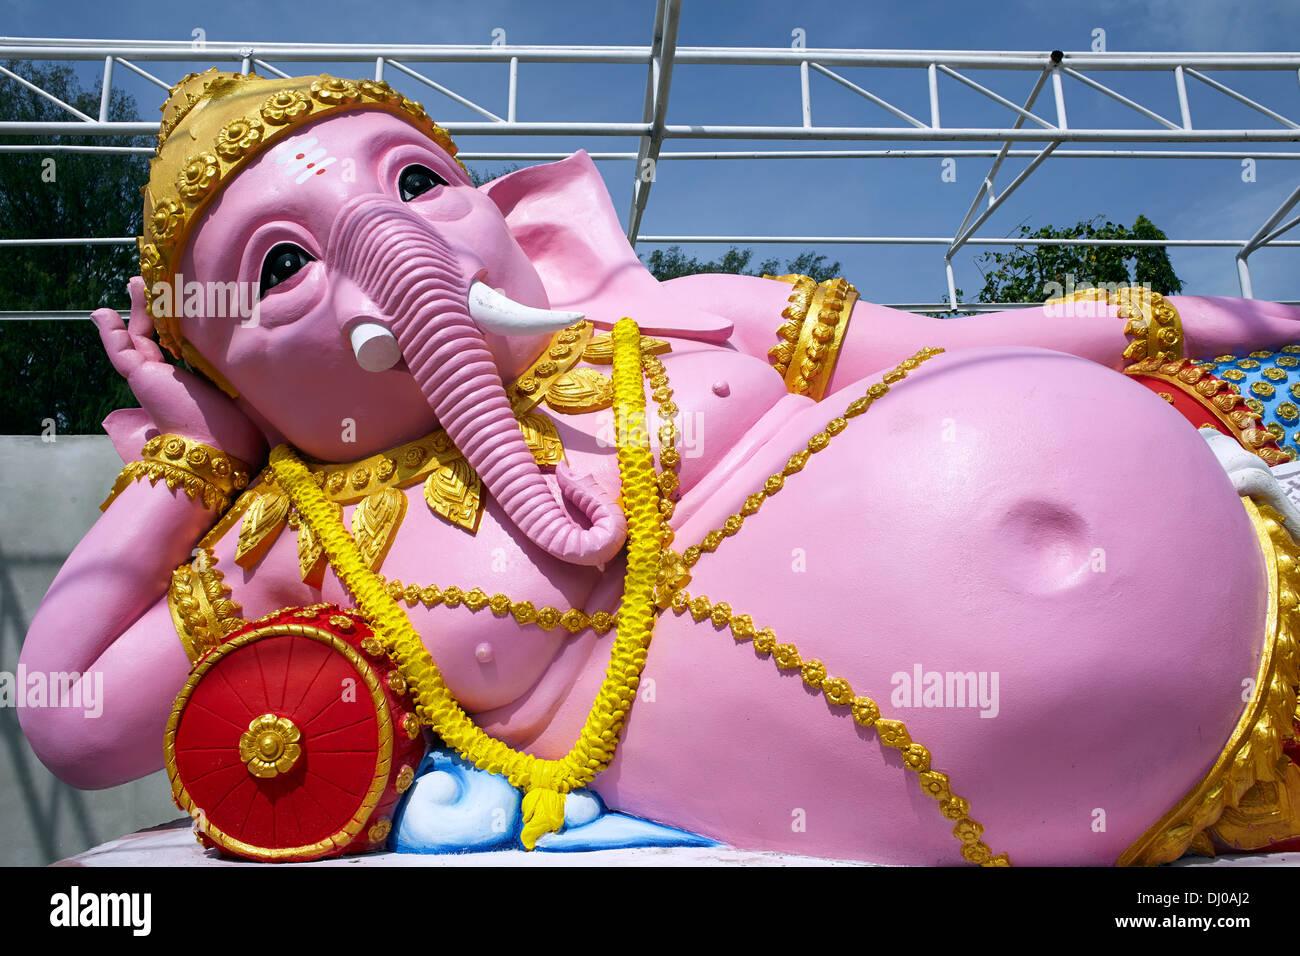 Reclining pink Ganesha deity statue Thailand S. E. Asia - Stock Image